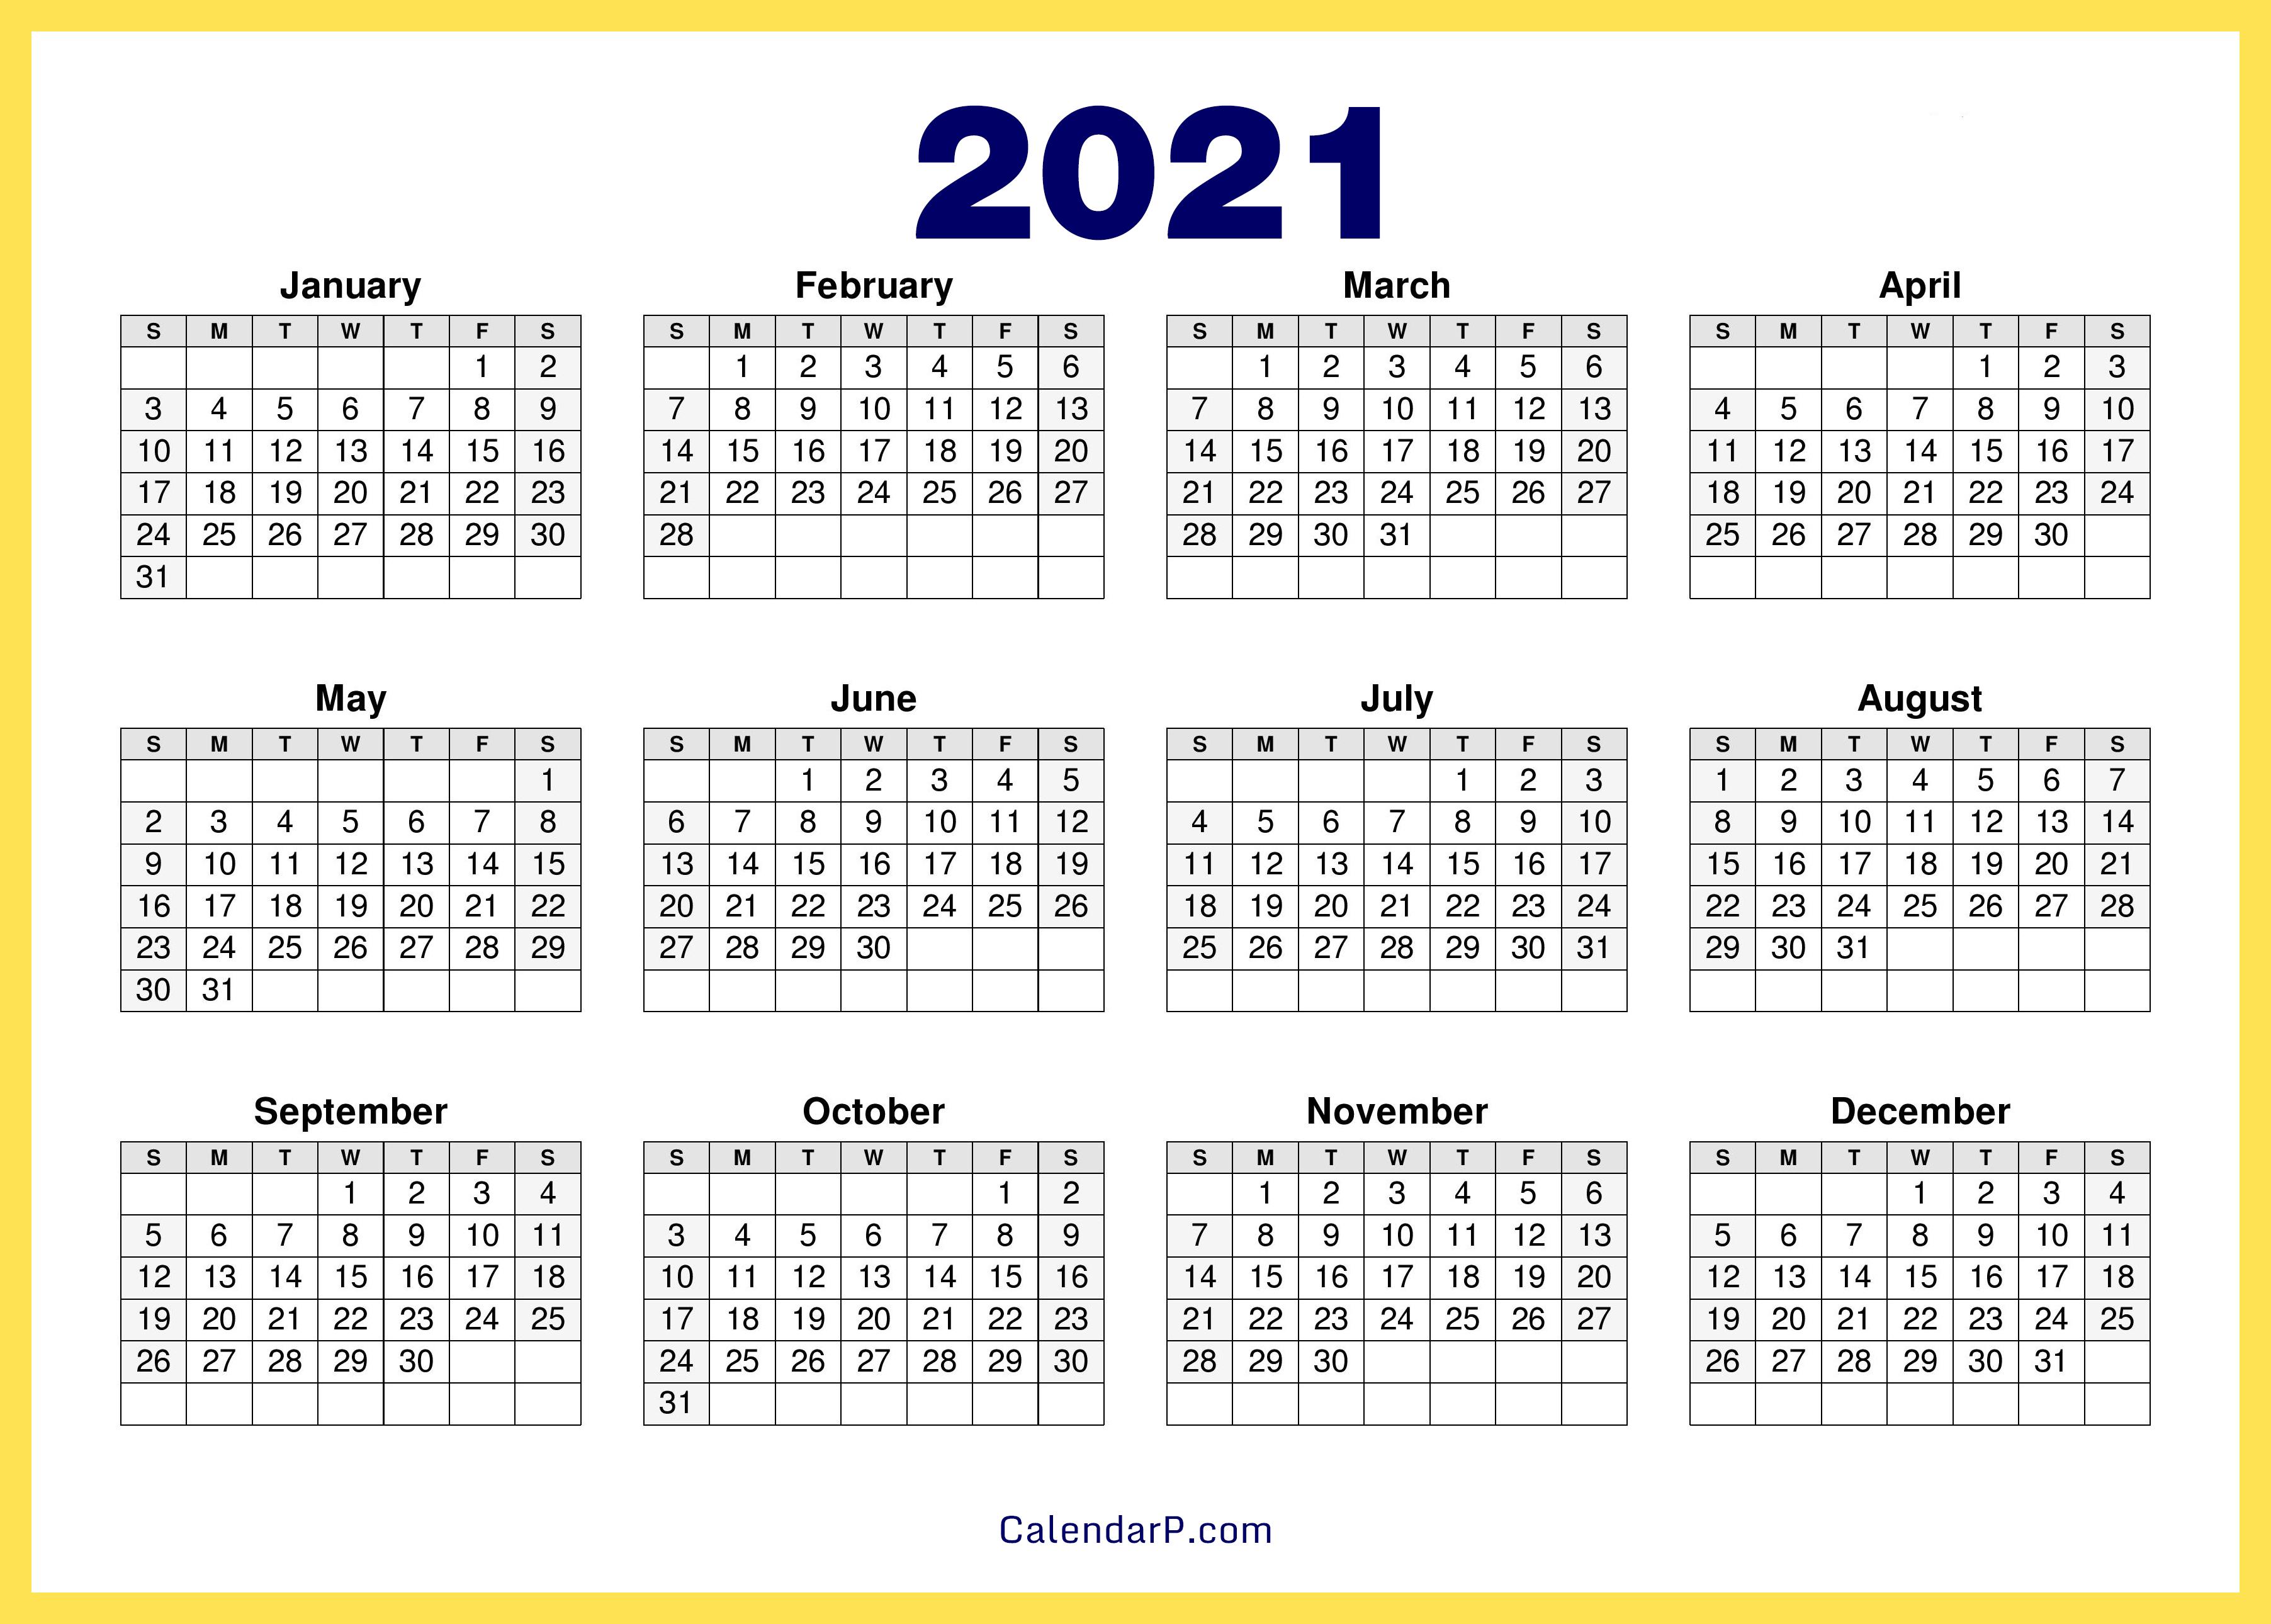 20 Calendar Printable Free, HD – Yellow – CalendarP   Printables